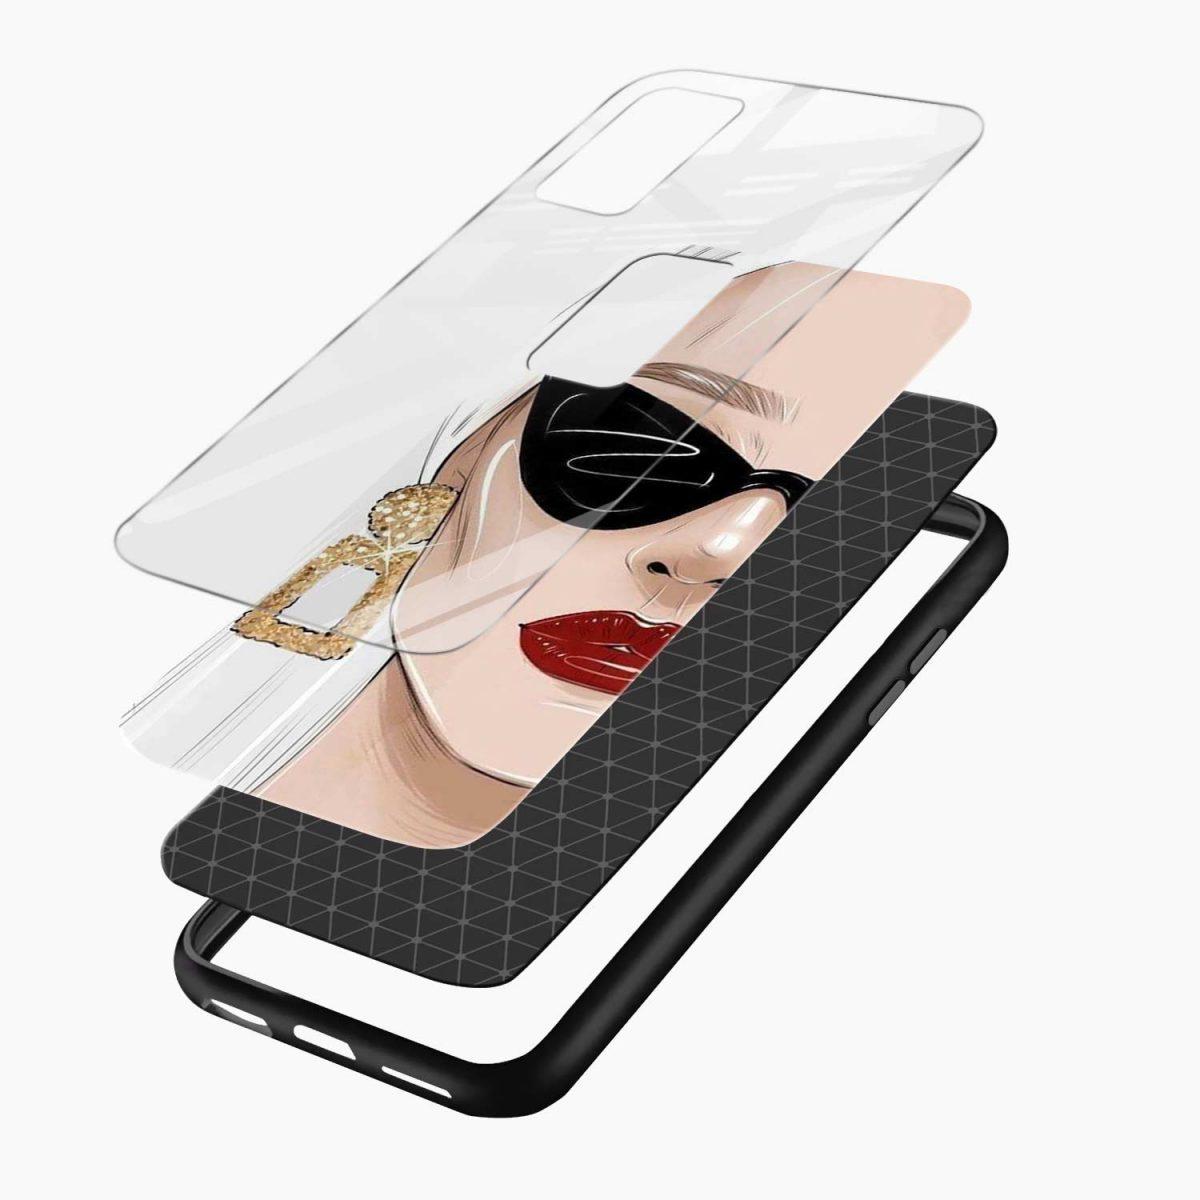 stylish women xiaomi mi 10t pro back cover layers view